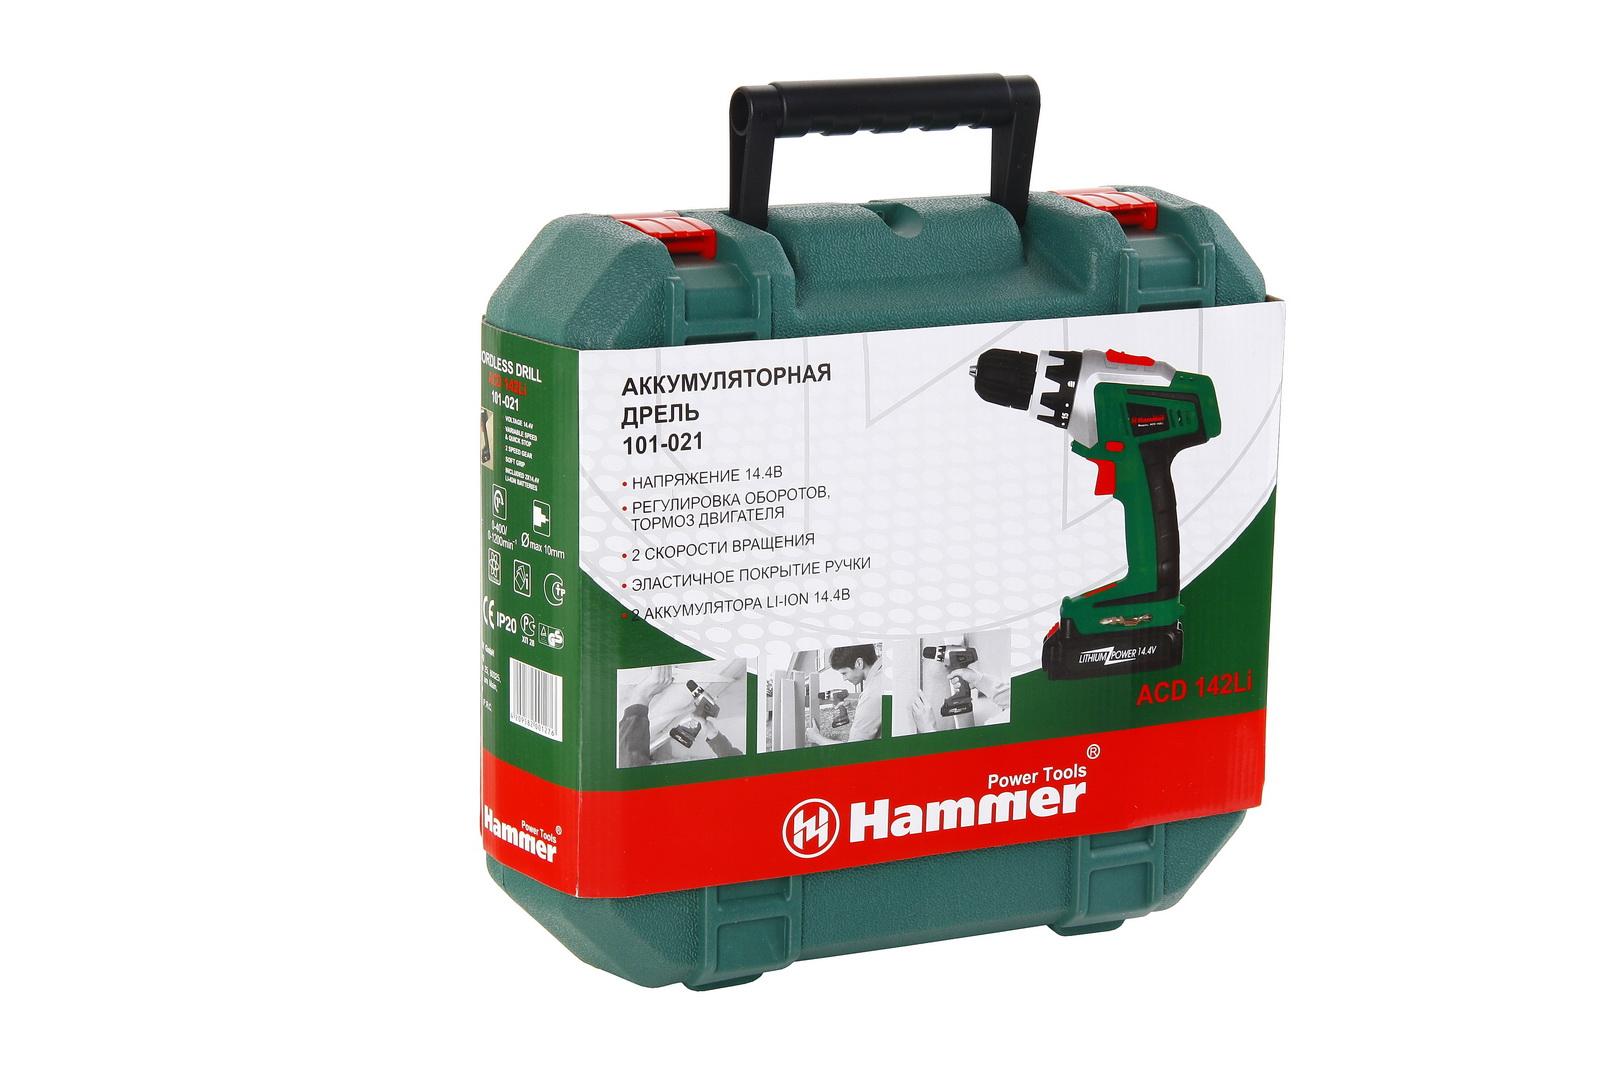 Аккумуляторная дрель-шуруповерт Hammer Acd142li